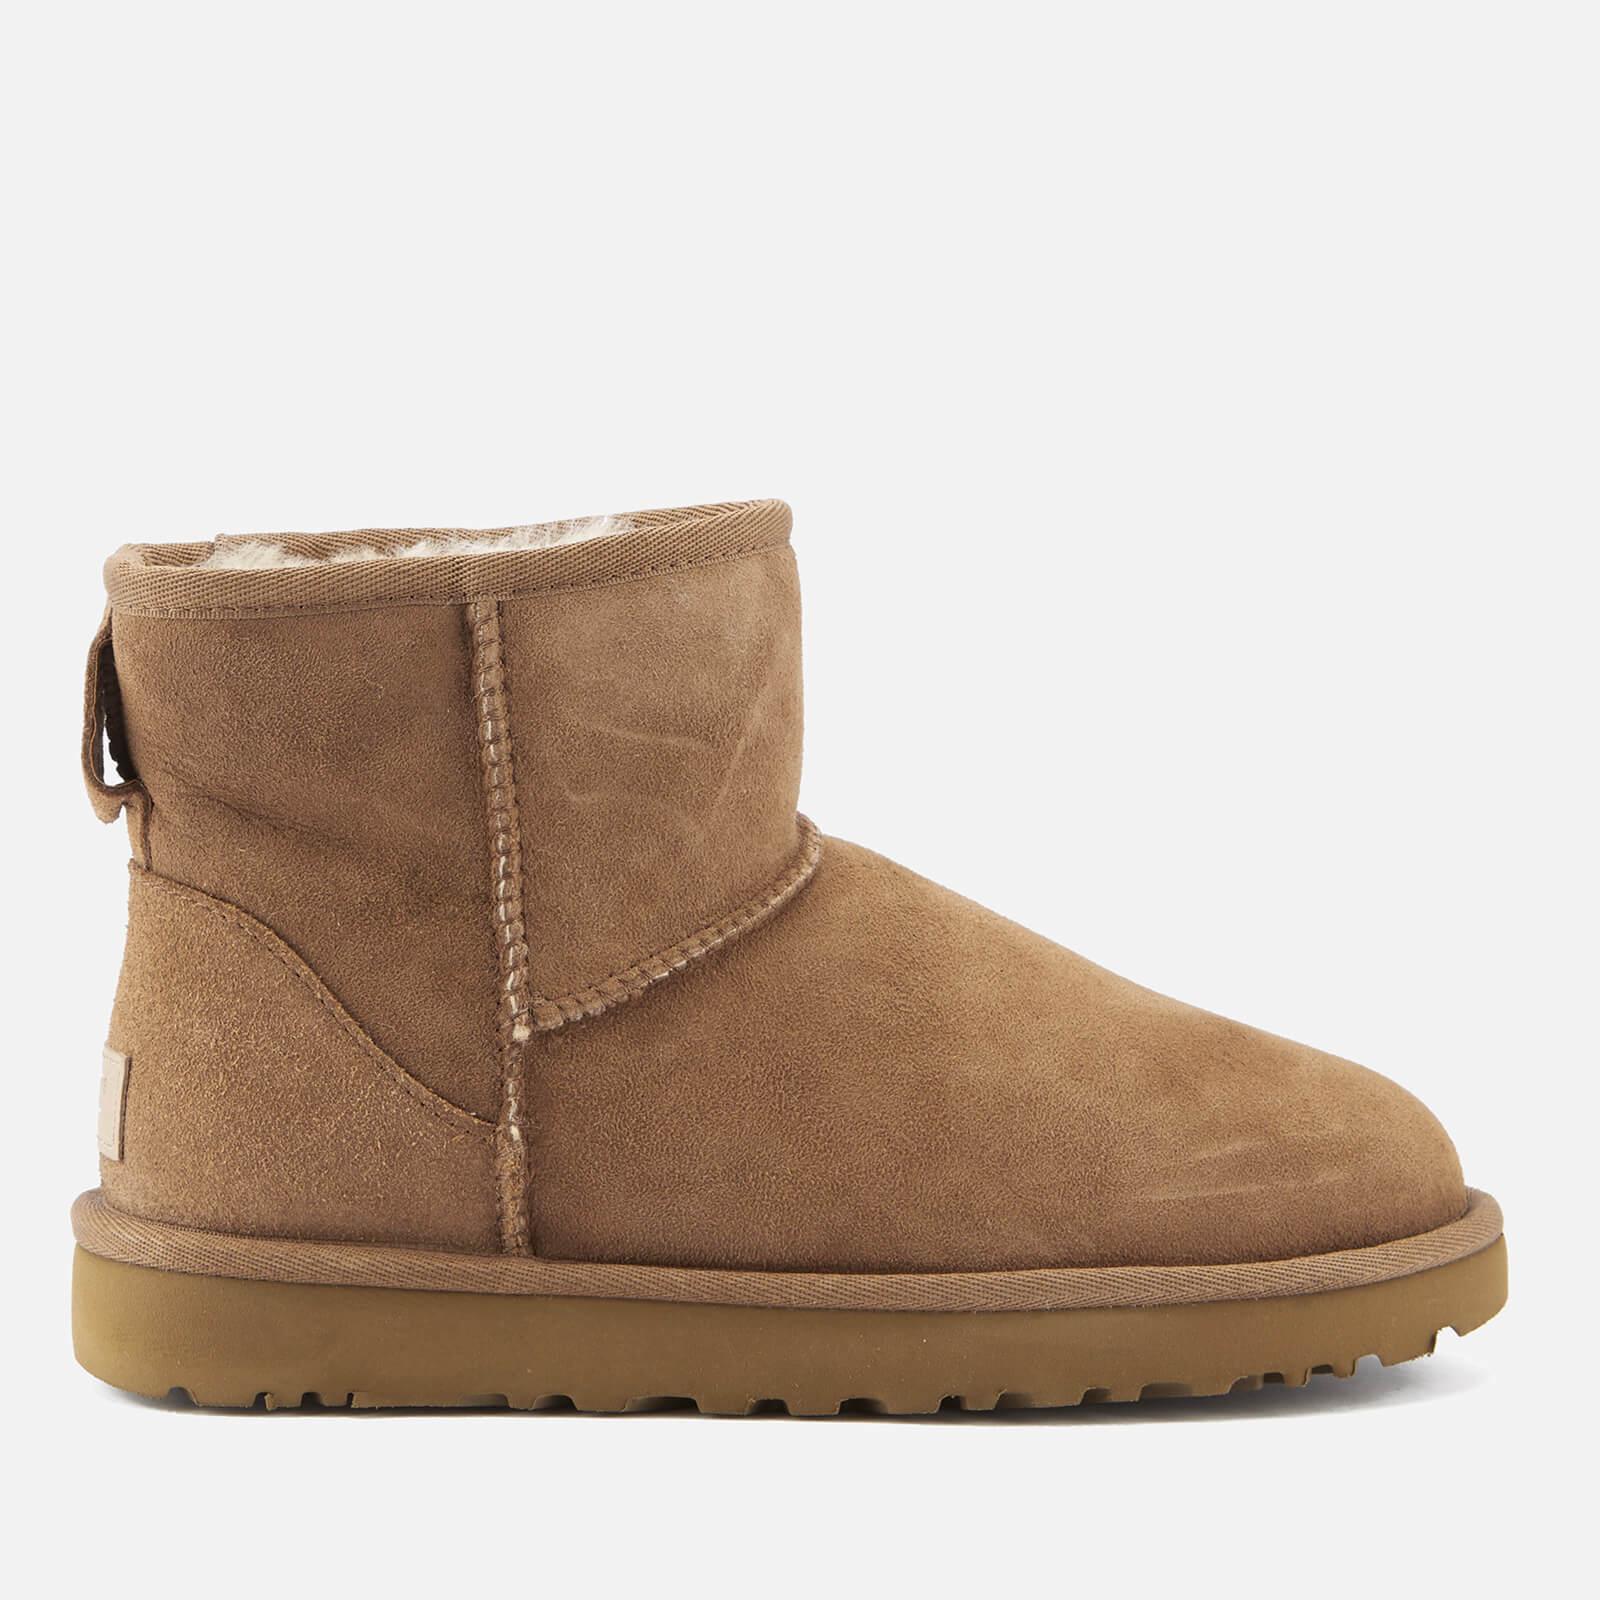 04b93f23471 UGG Women's Classic Mini II Sheepskin Boots - Chestnut